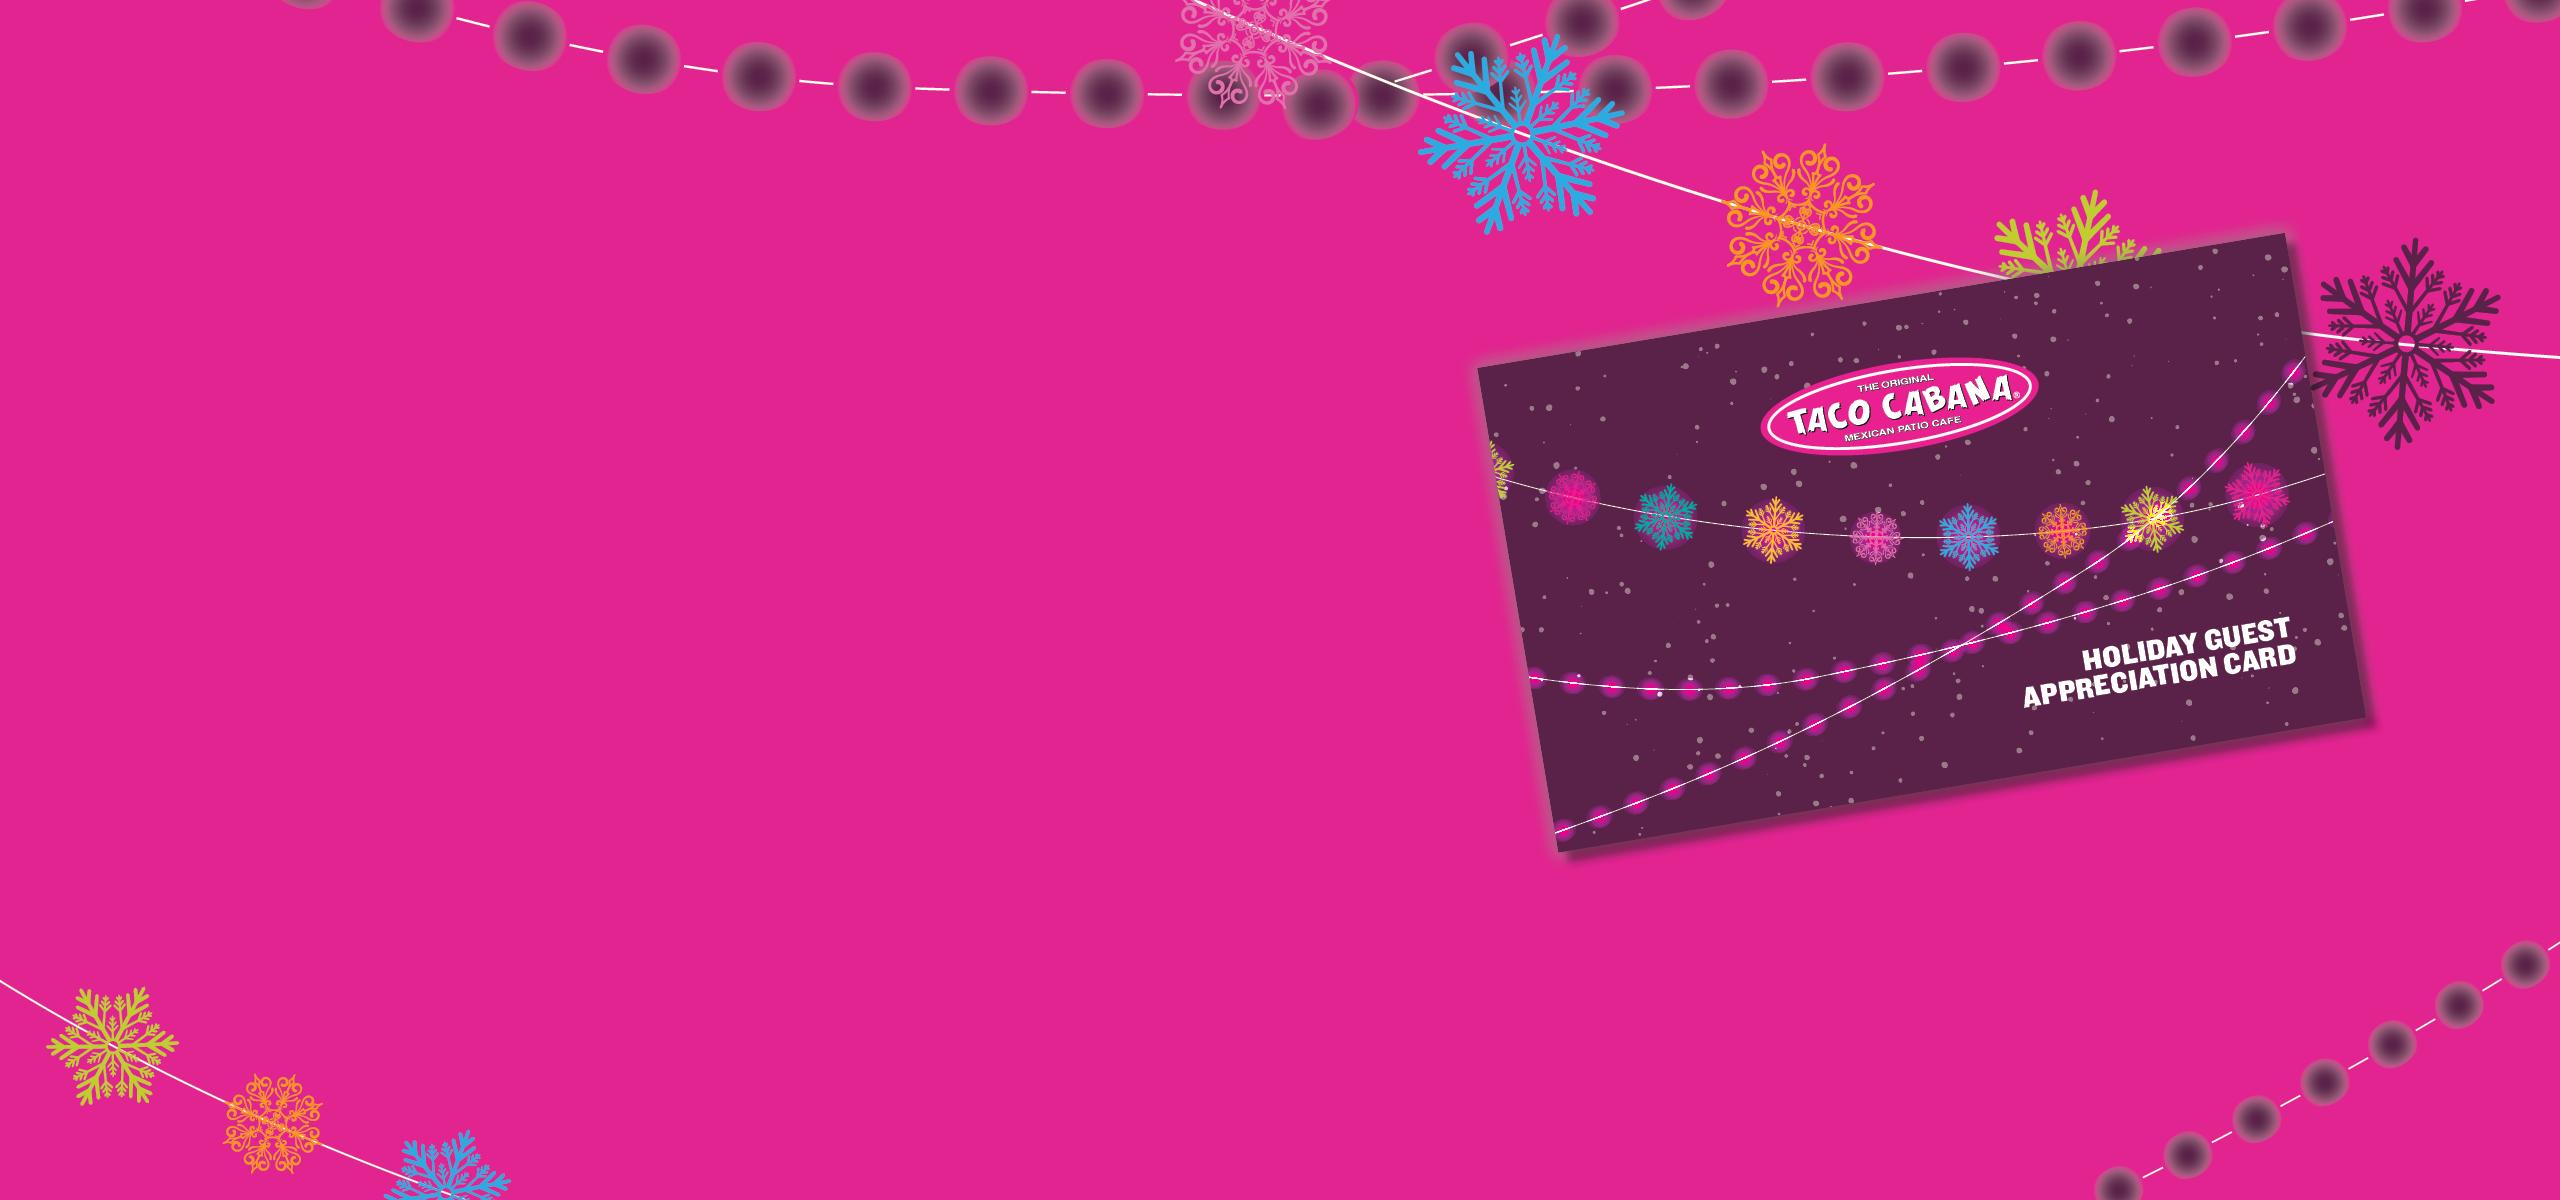 Taco Cabana Gift Cards Christmas 2020 Mexican Fast Casual Restaurant | Taco Cabana